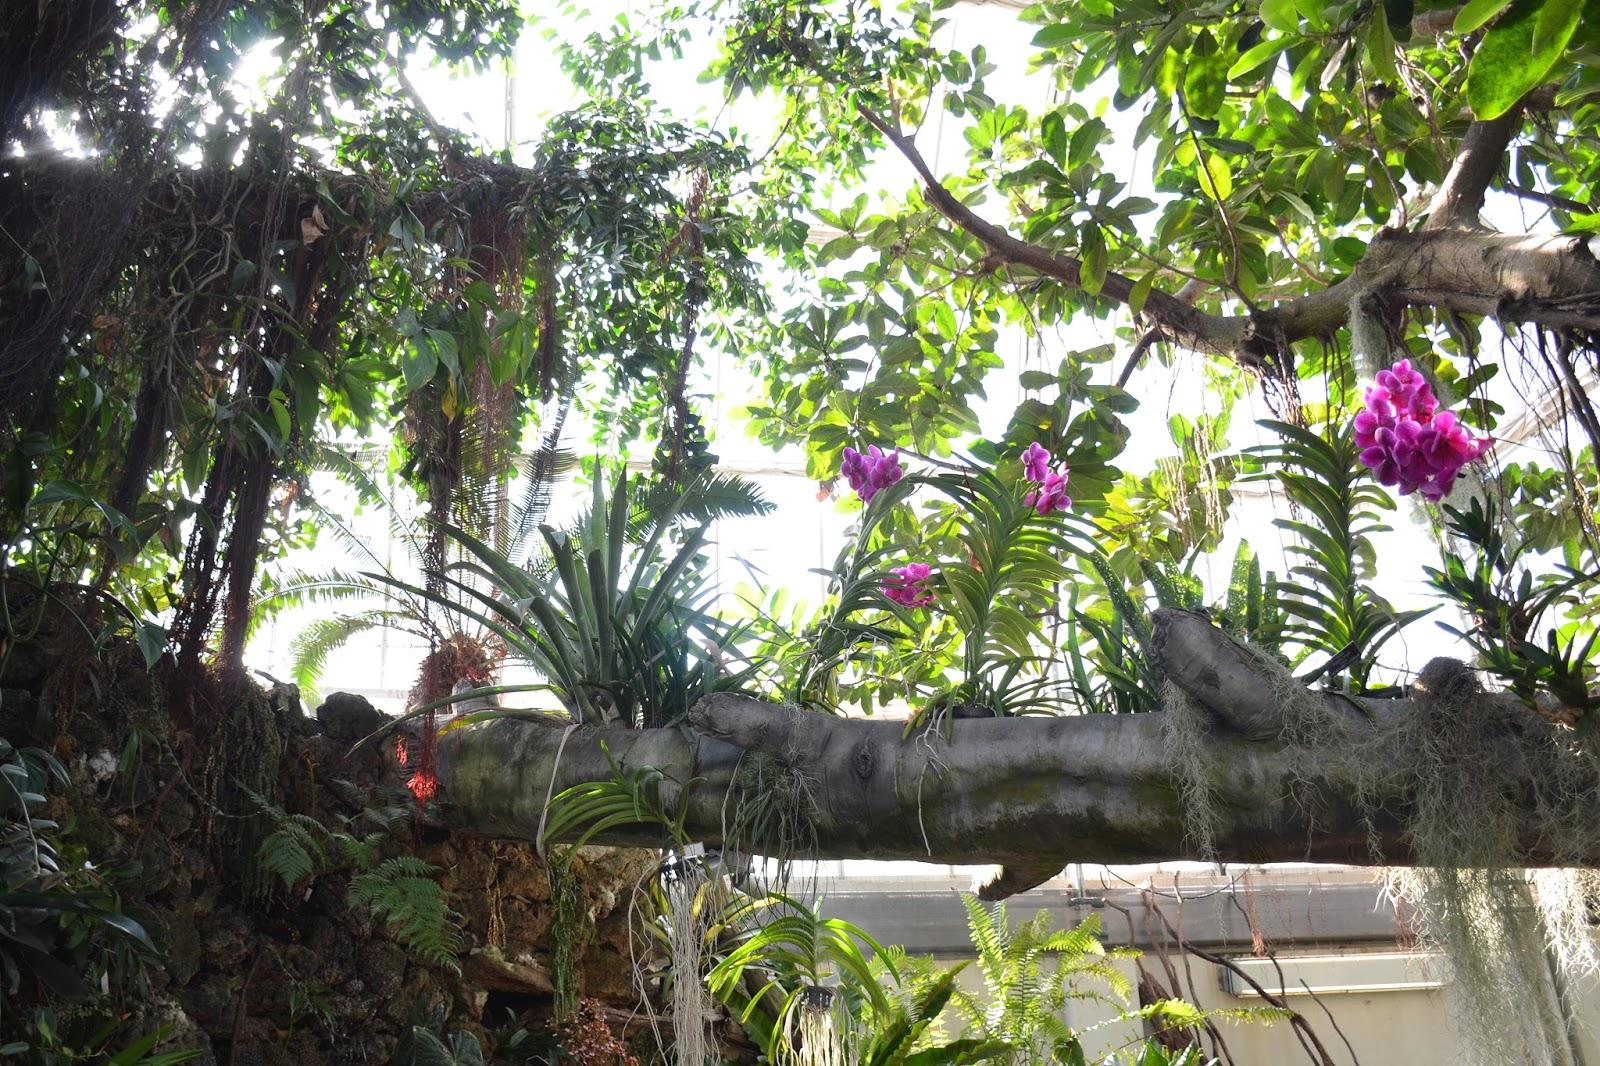 Lostvestige National Botanical Gardens